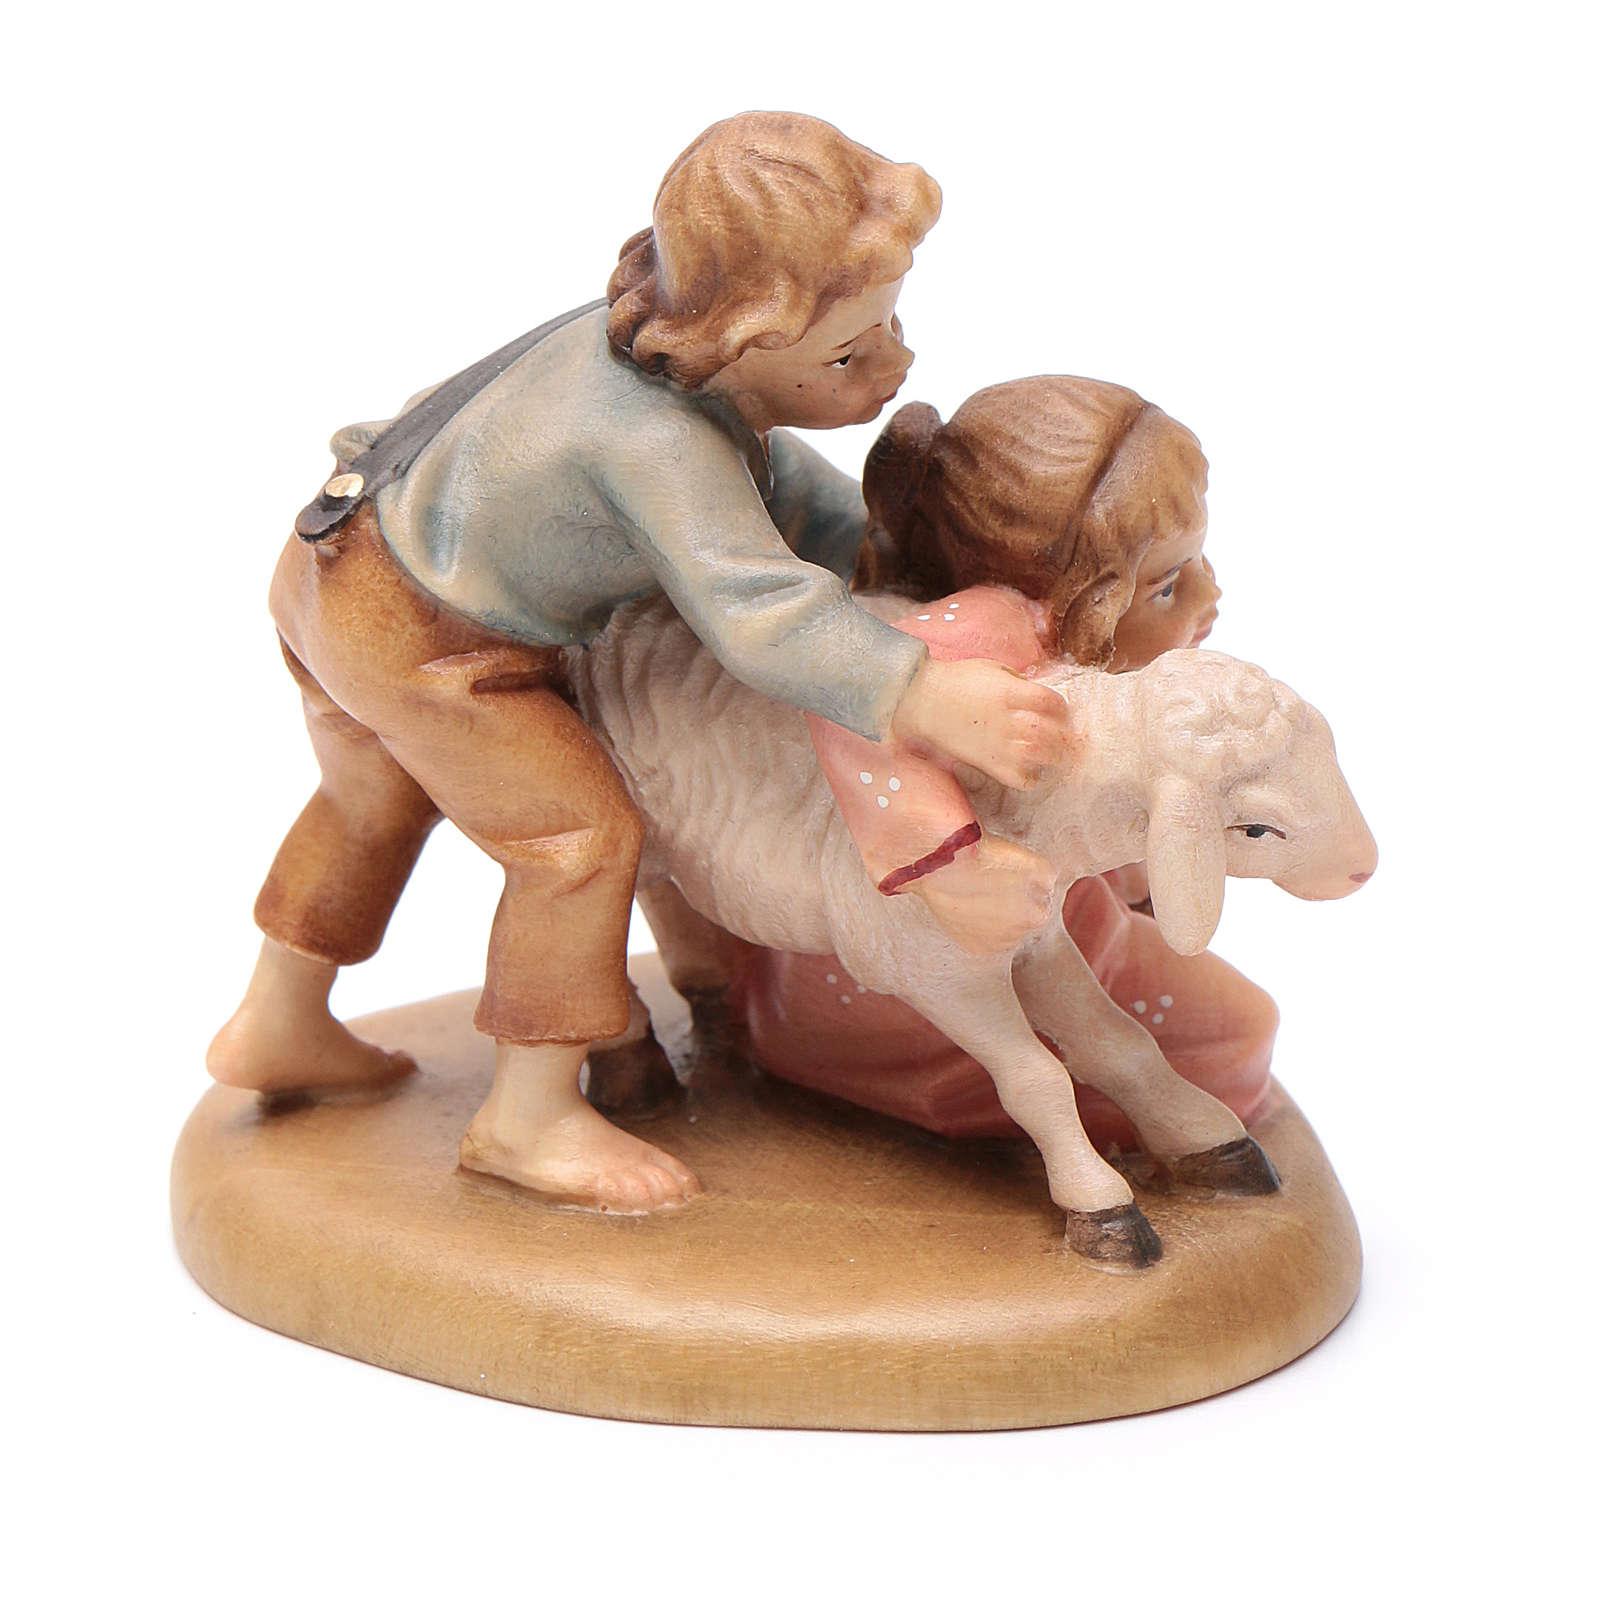 Pastorelli con pecore 12 cm legno presepe mod. Valgardena 4